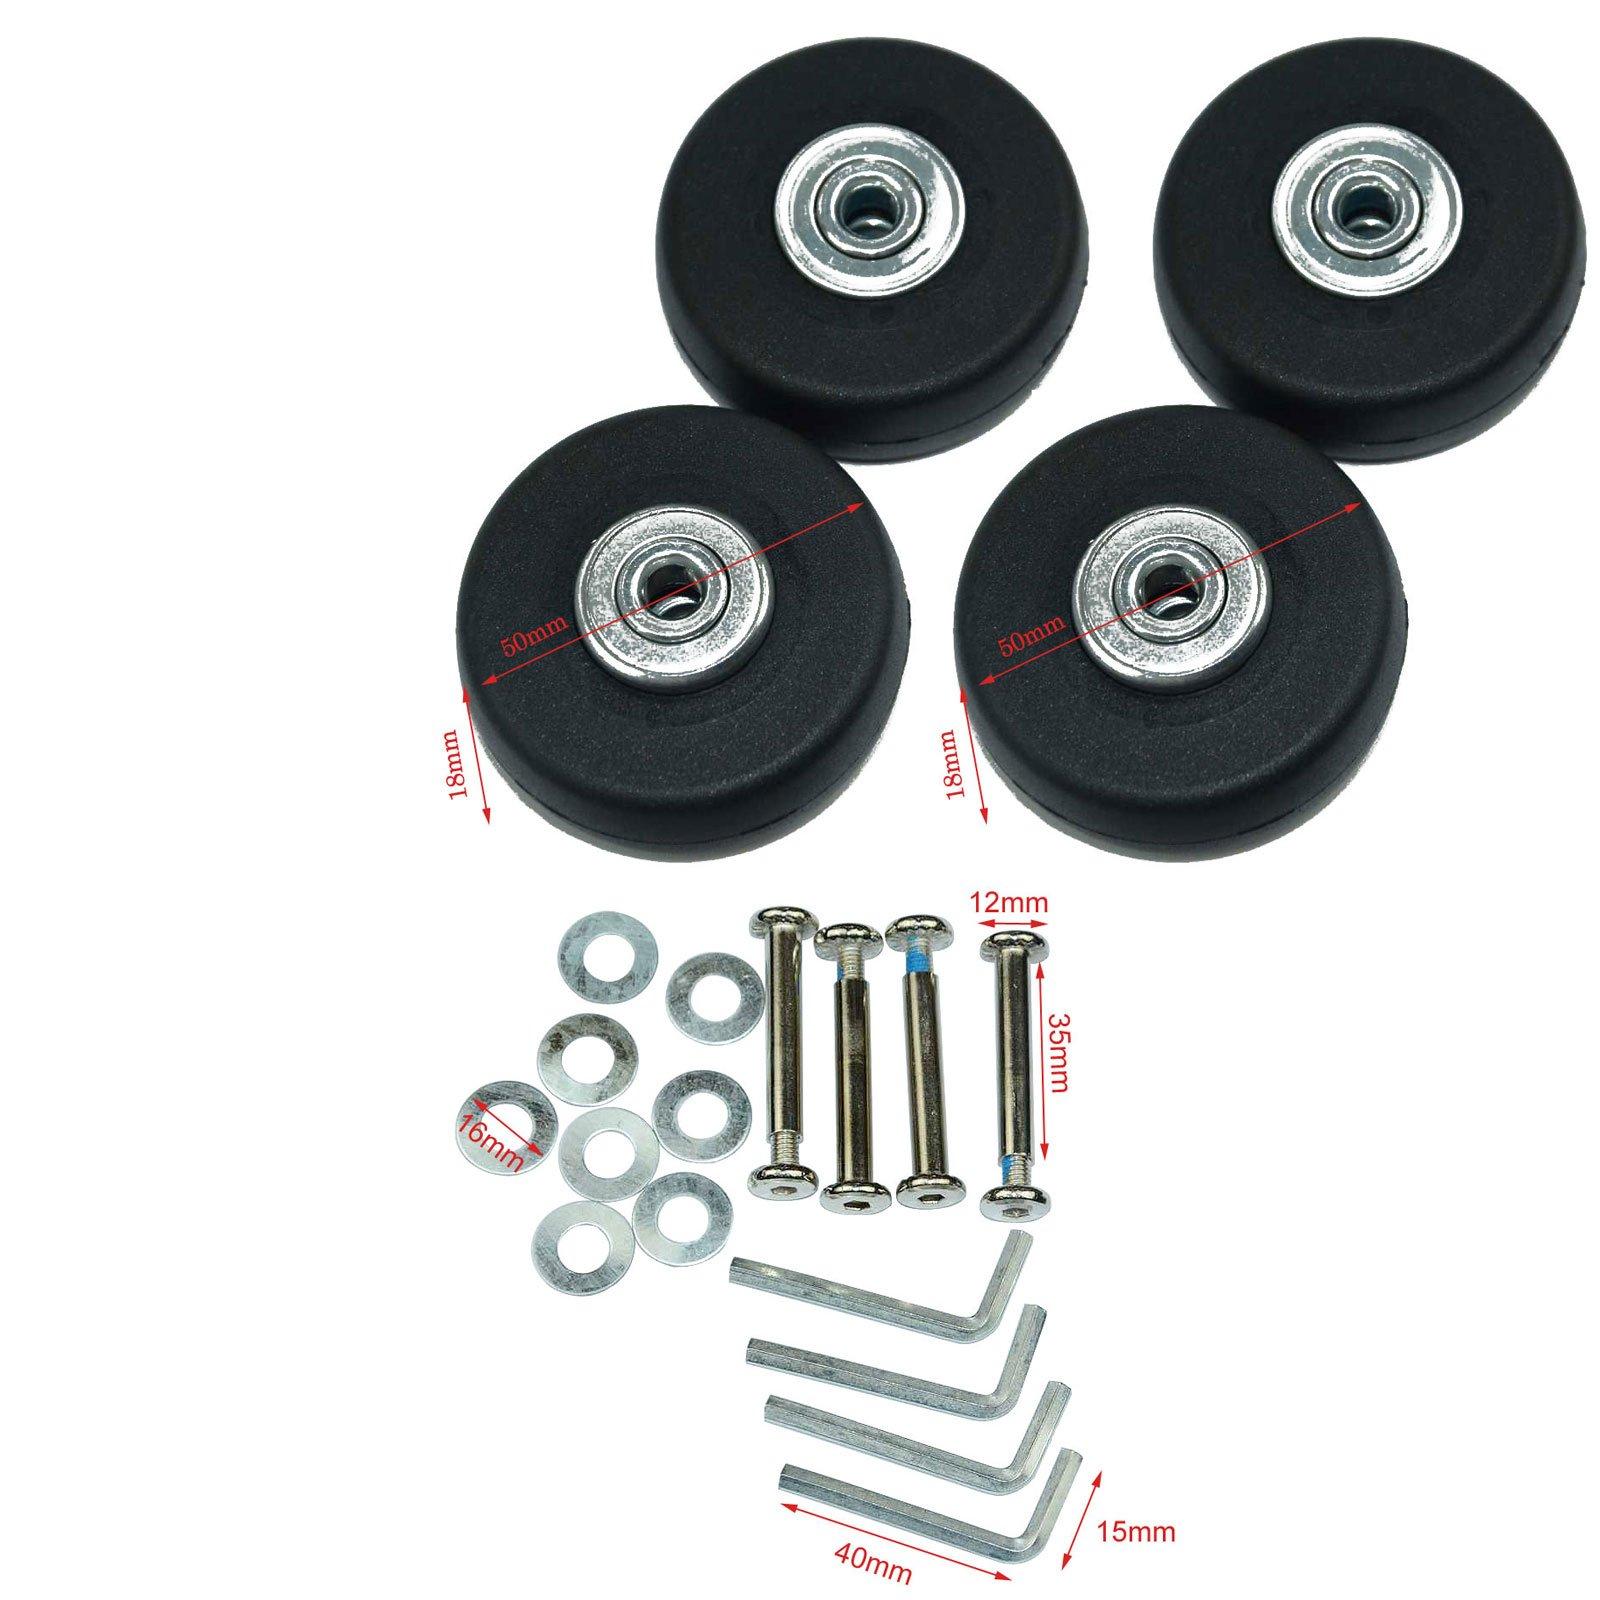 Lovinstar 4Pcs/Set Luggage Suitcase Replacement Wheels OD 50 (1.97'') 18 Axles 35 Repair Set for Luggage Suitcase Repair